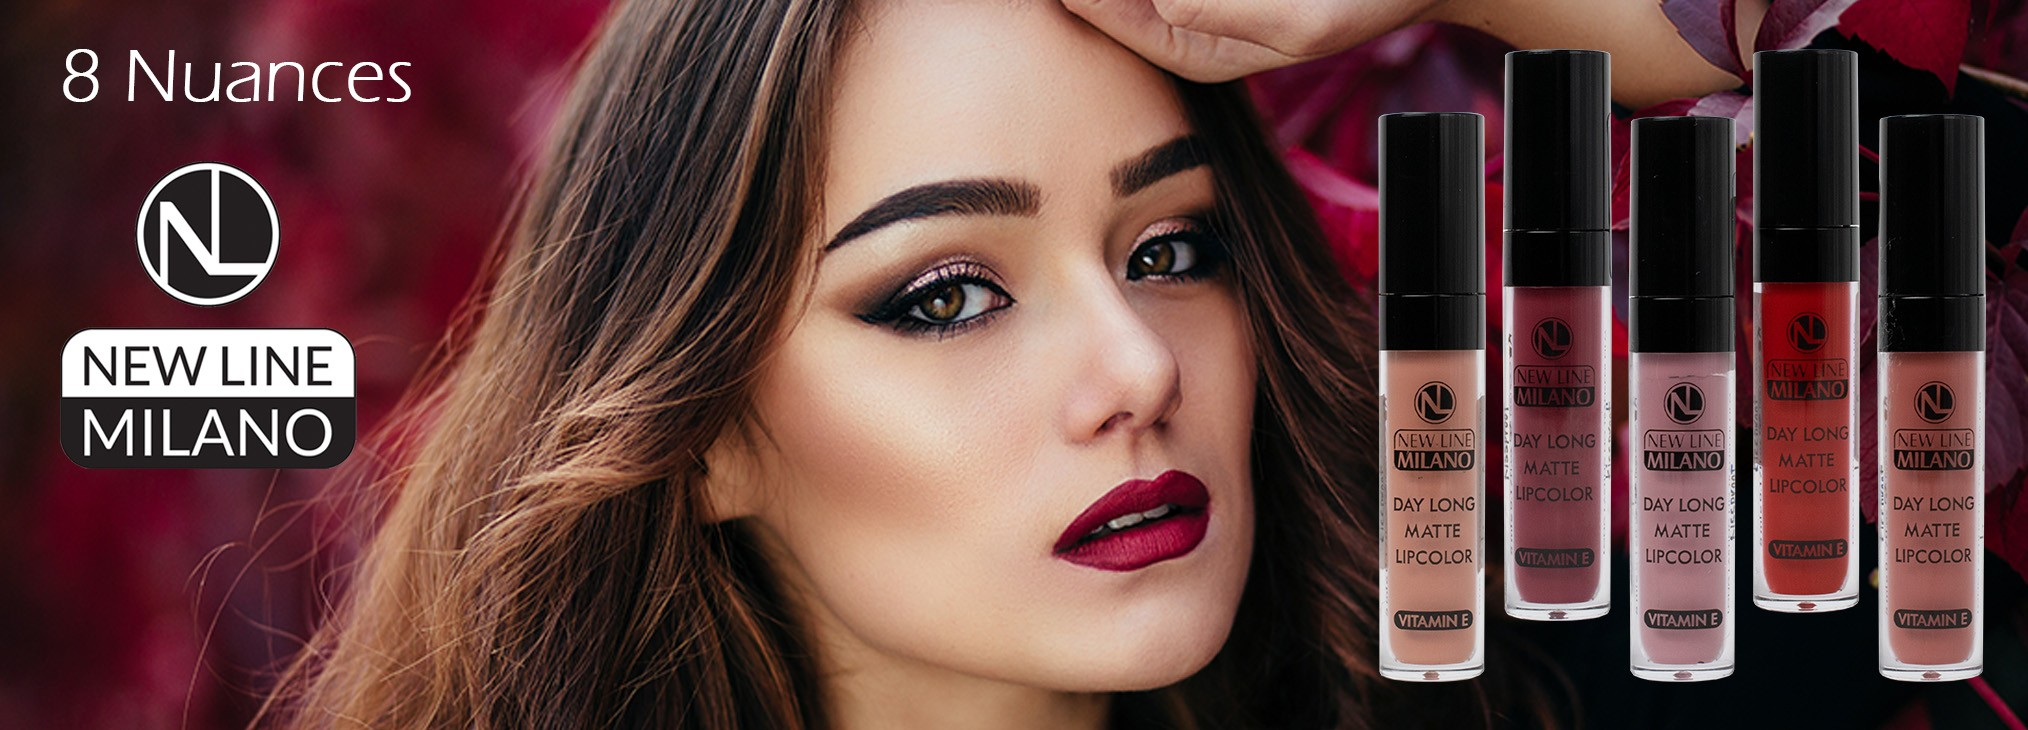 Newline lips